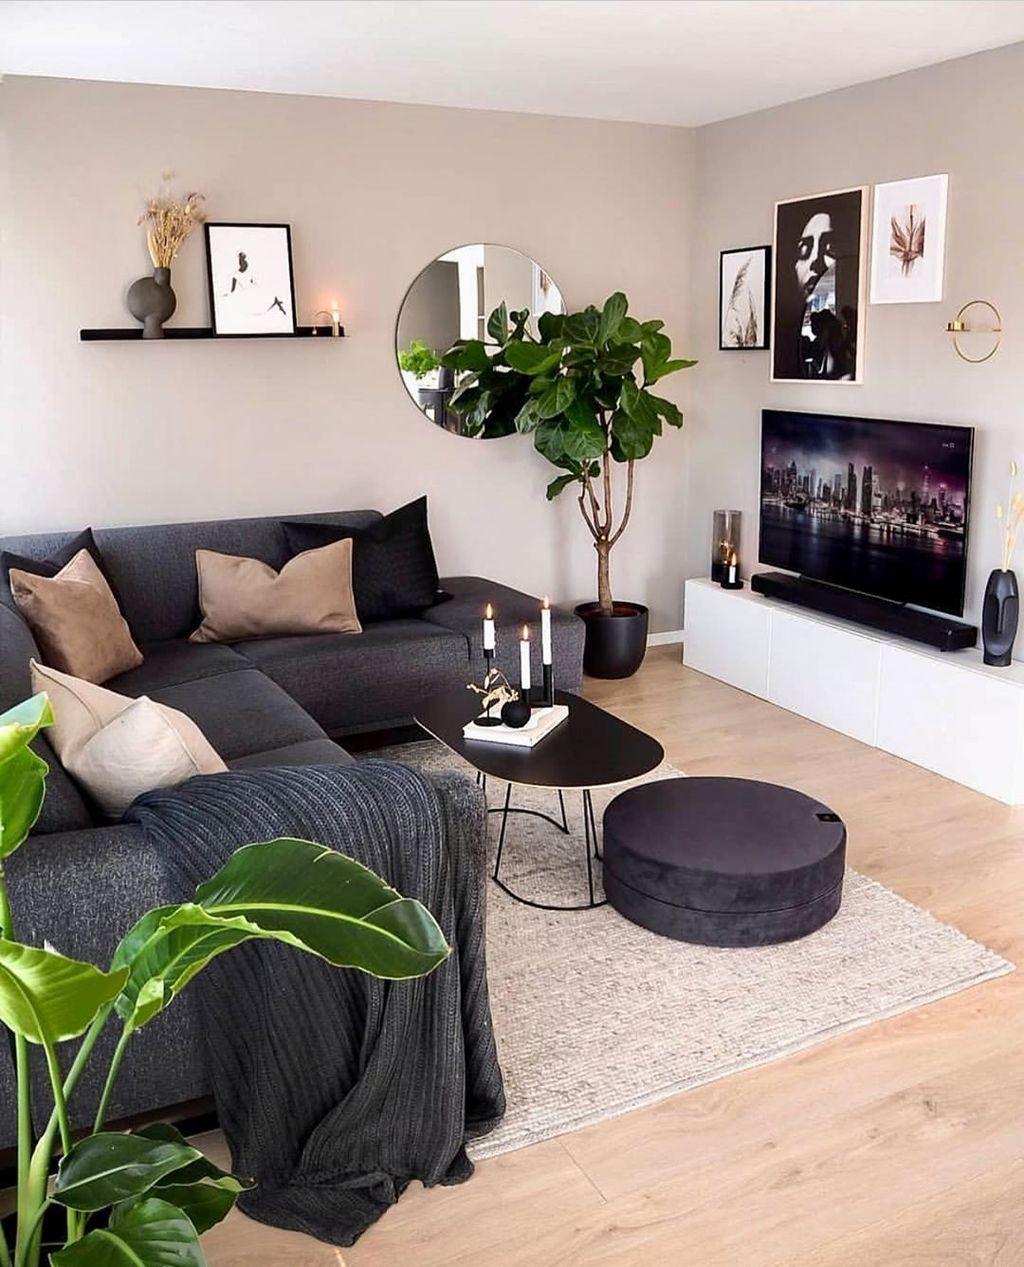 31 Admirable Cozy Living Room Decor Ideas Trendehouse Front Room Decor Living Room Designs Front Room